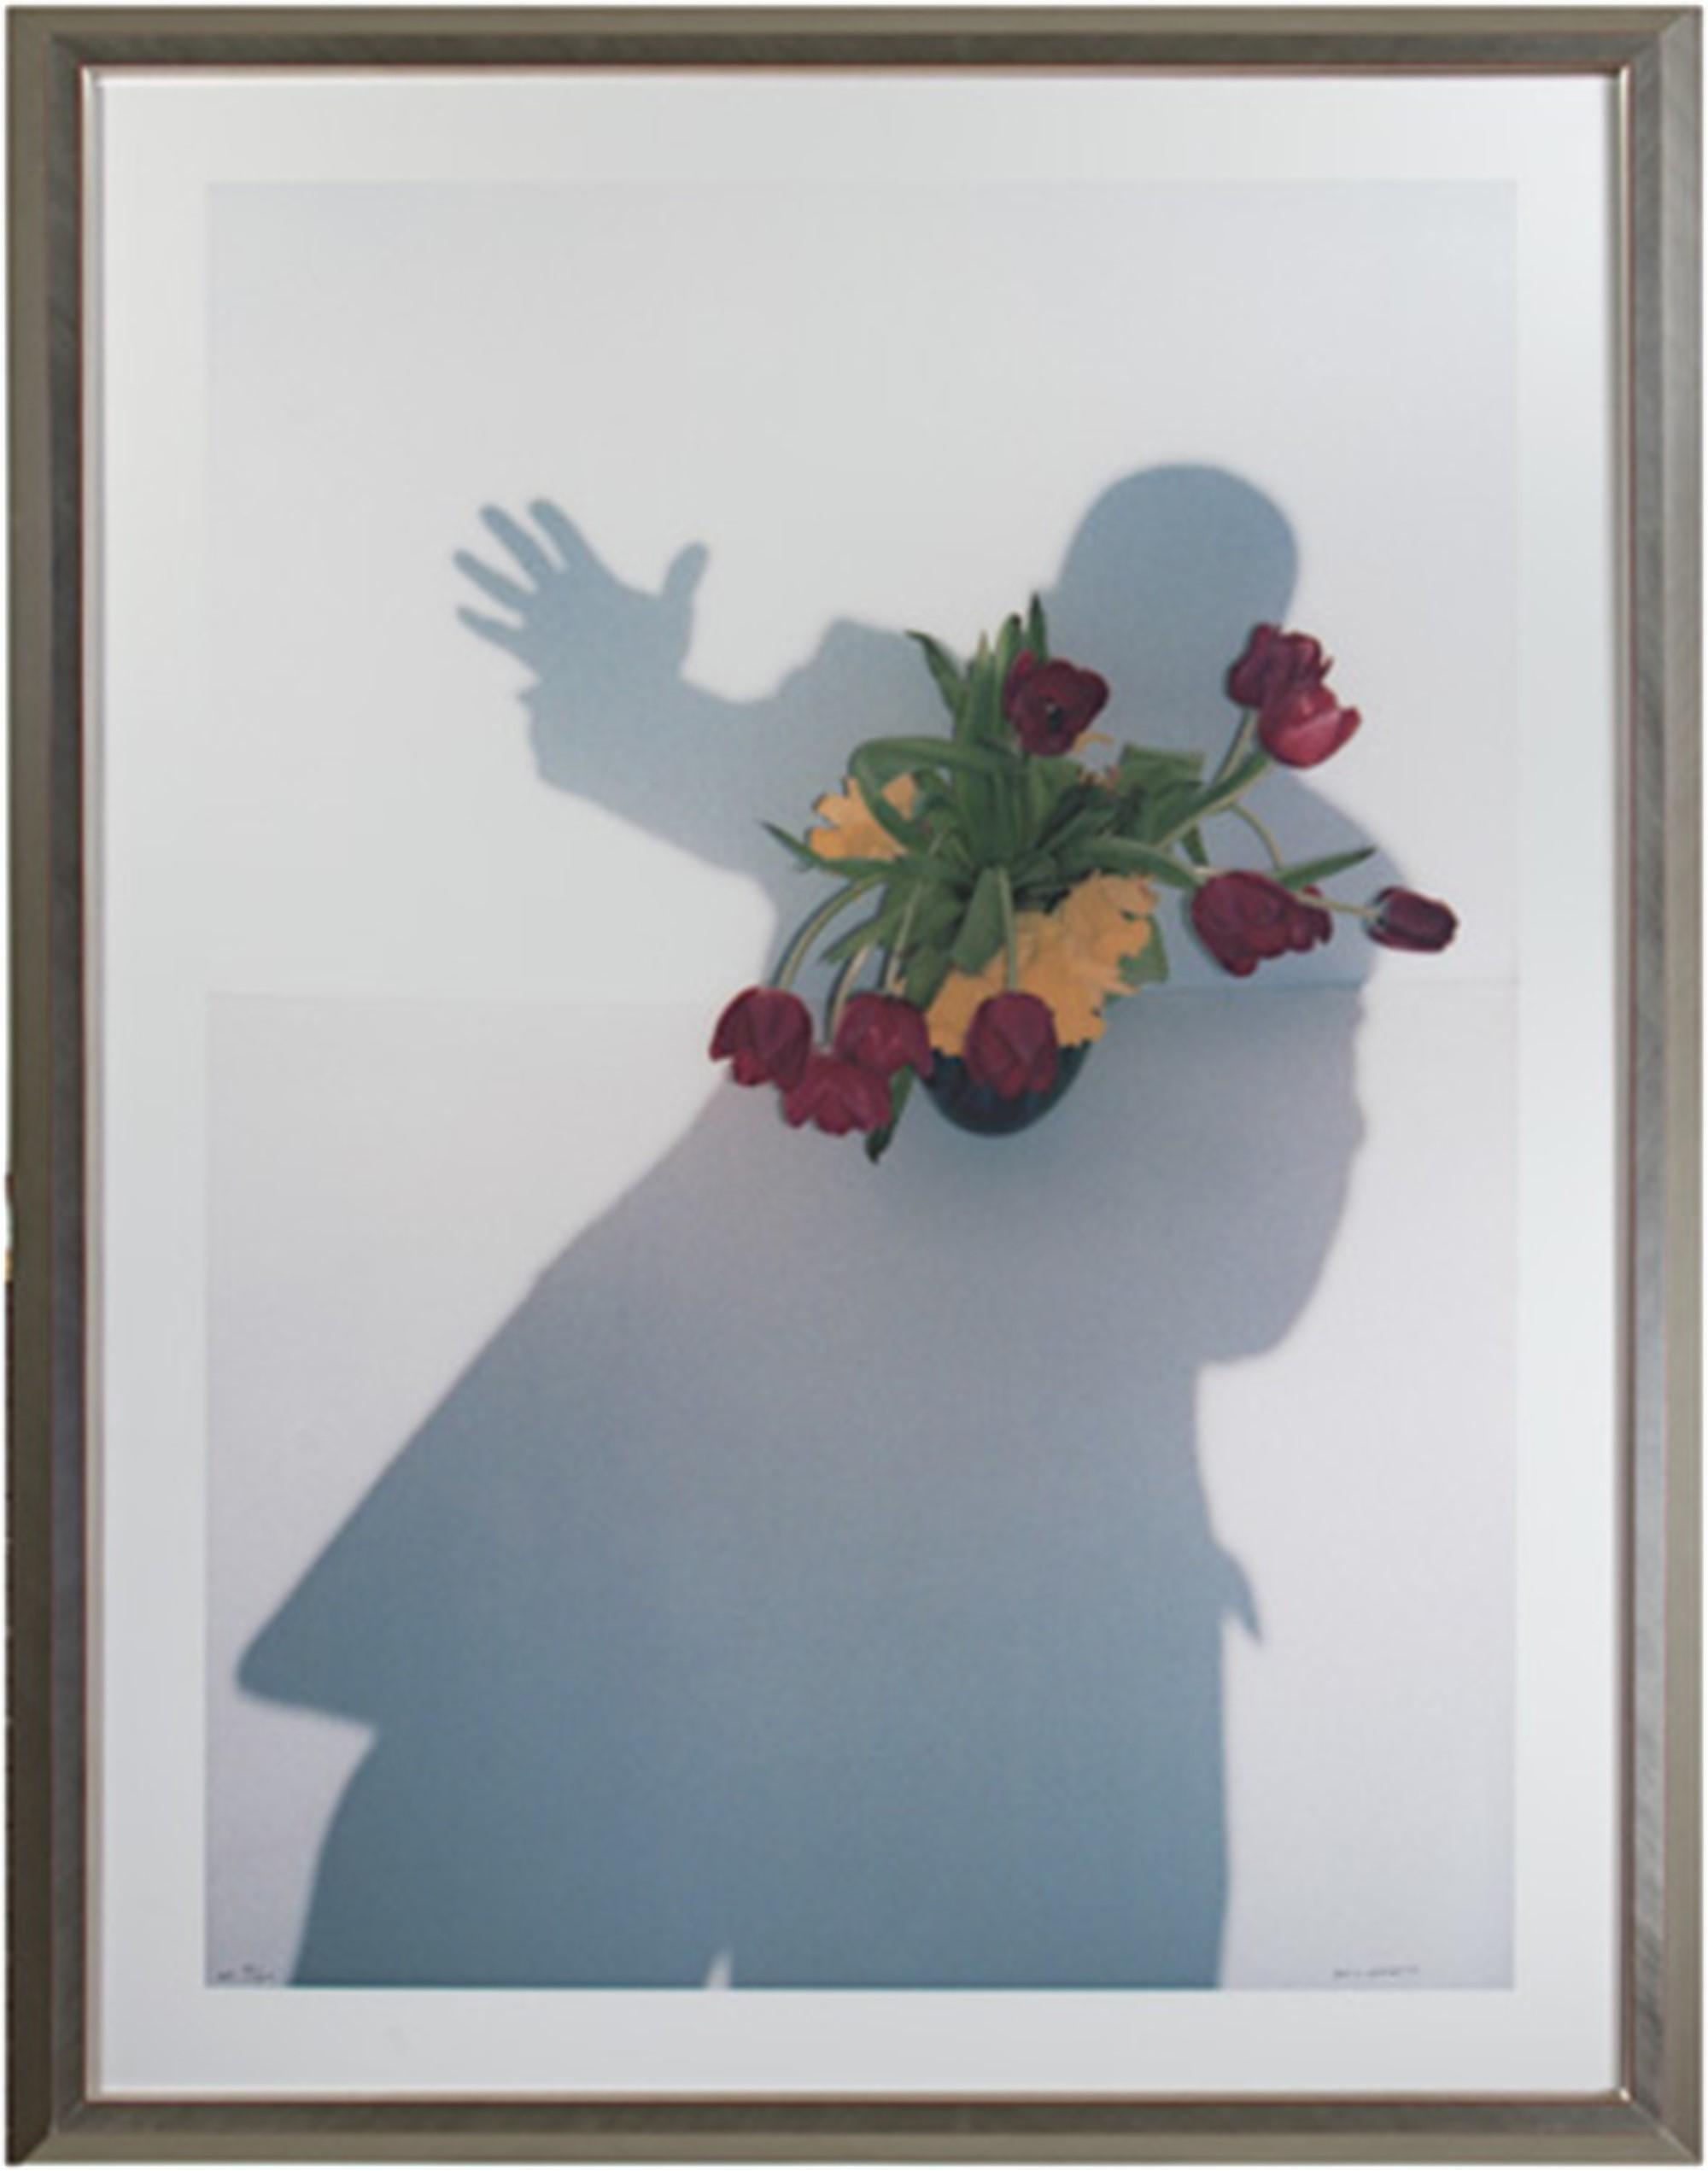 Self Portrait Shadow Series: Take My Hand, I'm a Stranger in Paradise by David Barnett